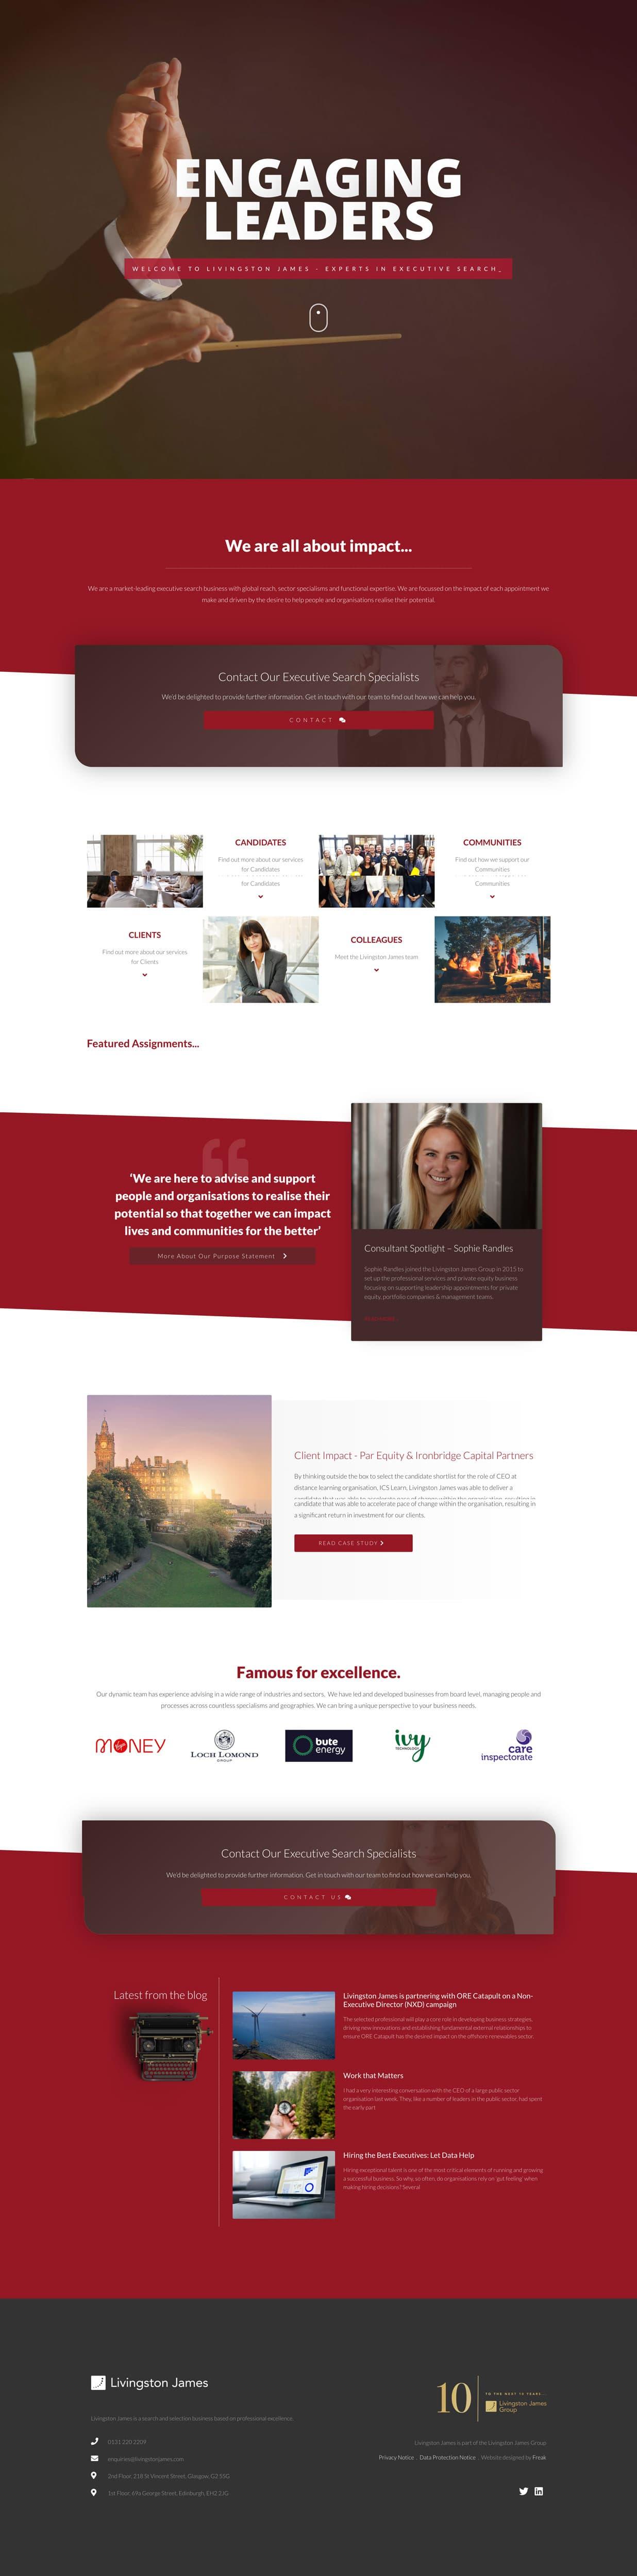 Livingston James Website Design